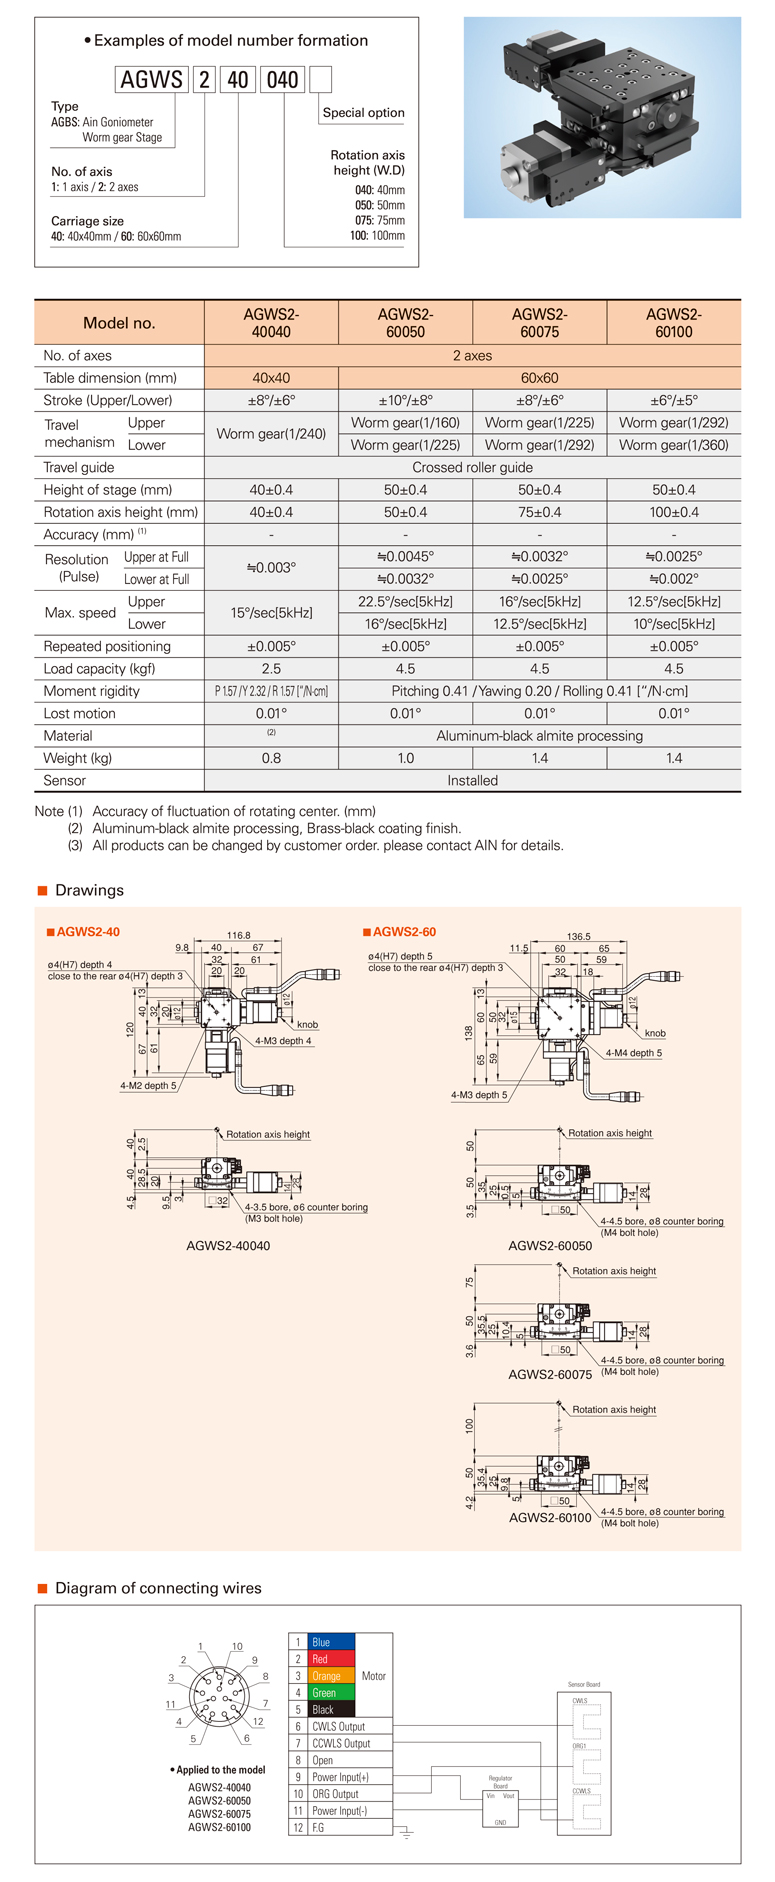 AIN Motorized Goniometer Worm Gear Stage AGWS2-40/60 Type